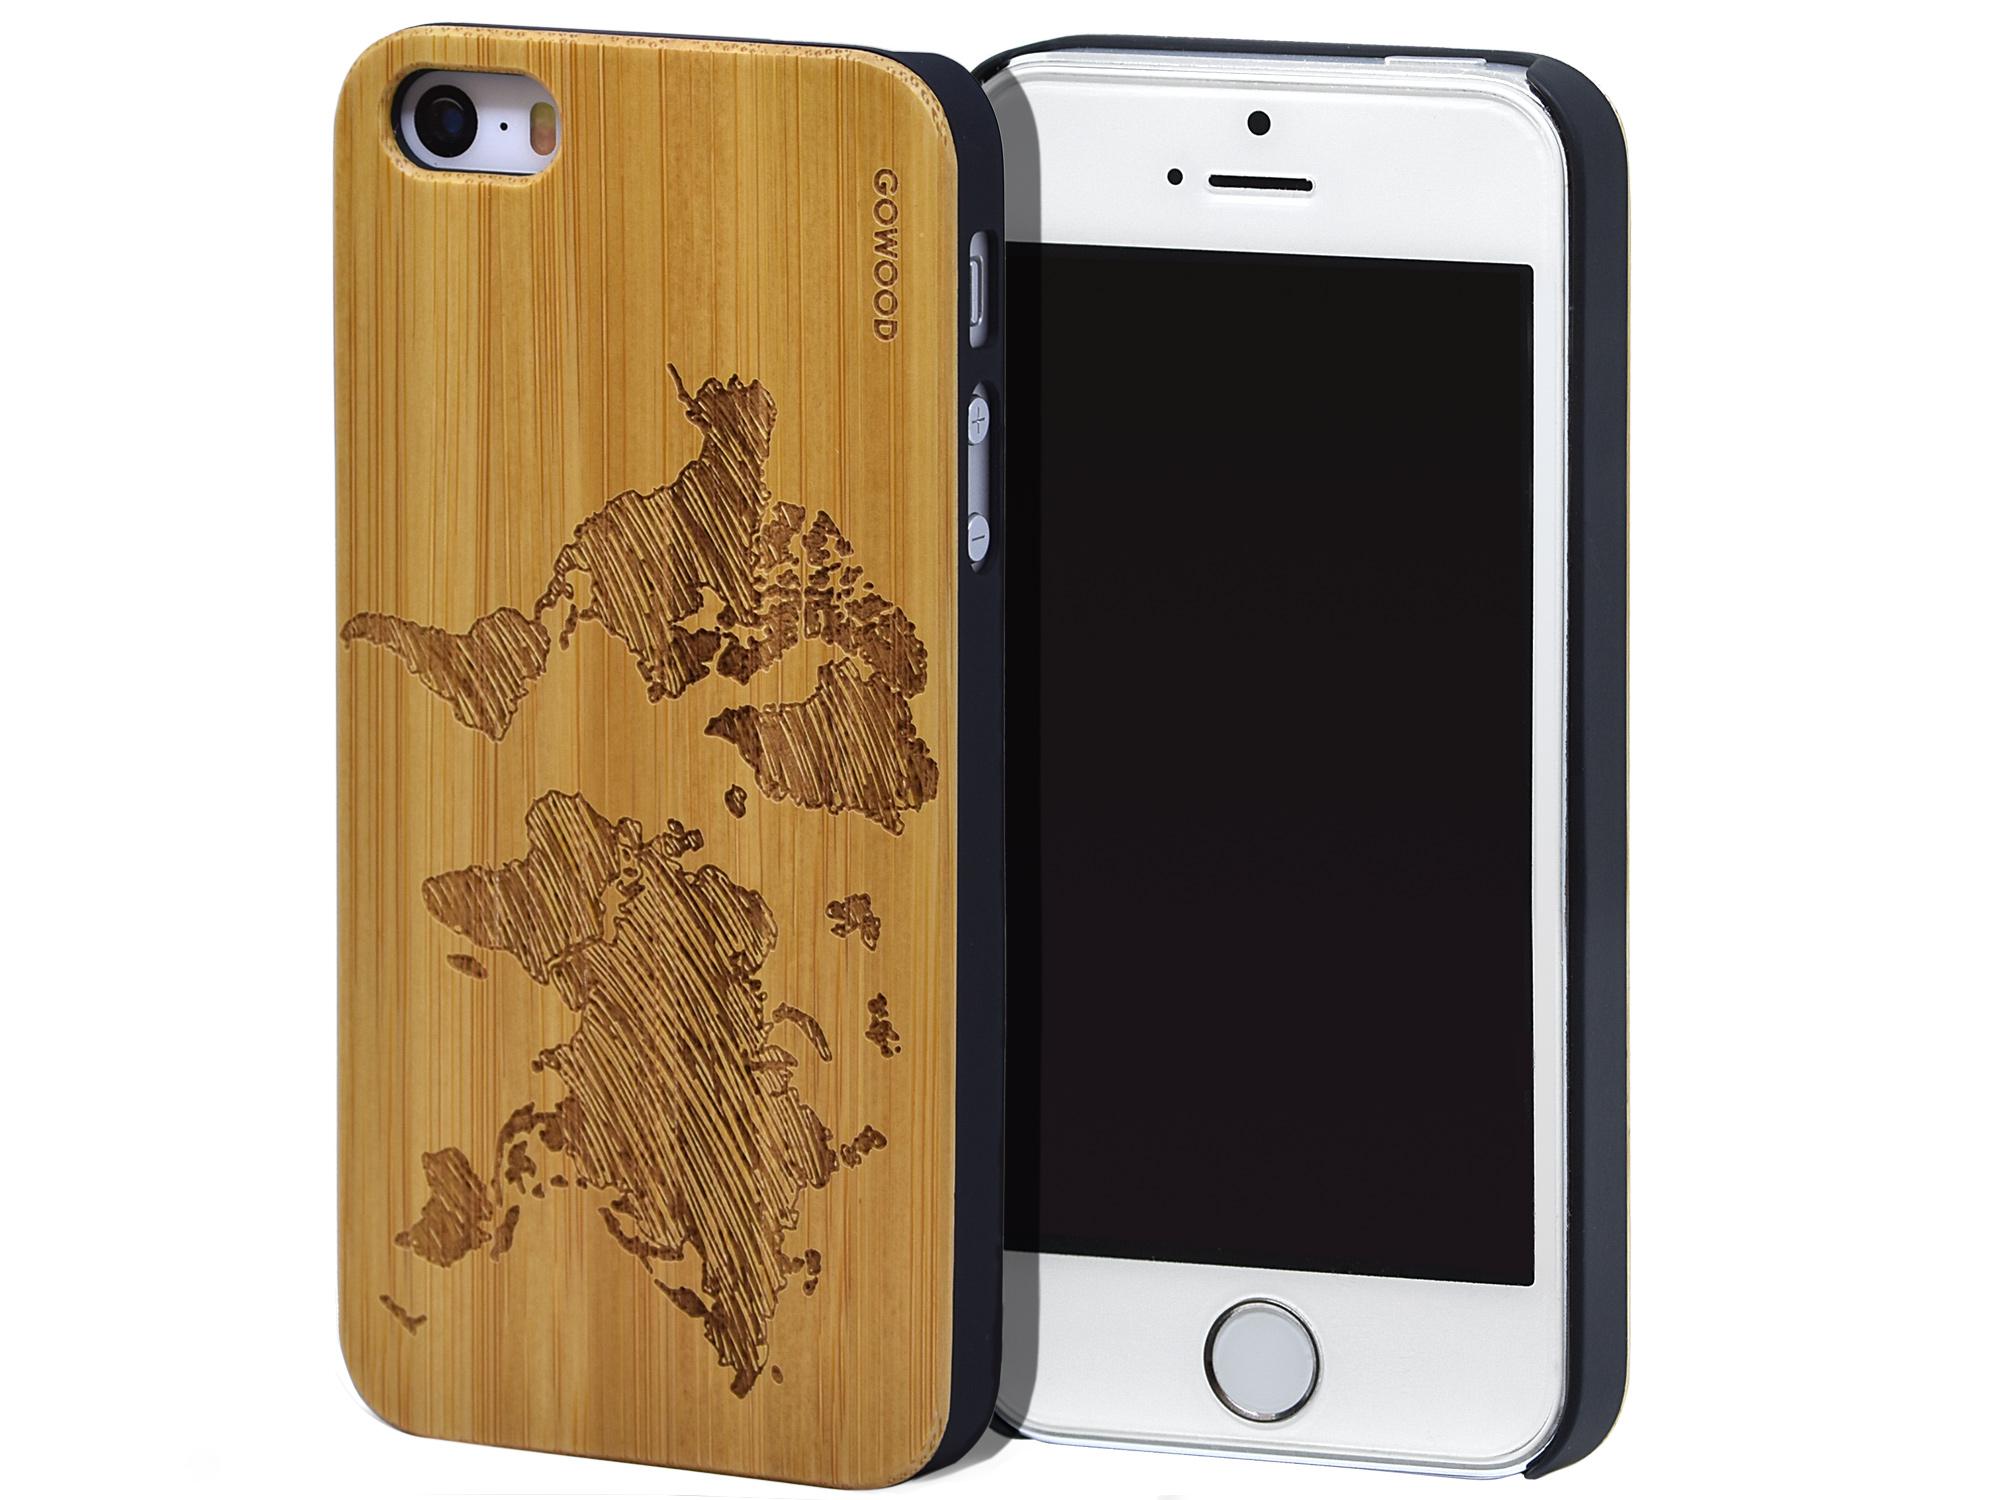 iPhone 5 wood case bamboo world map